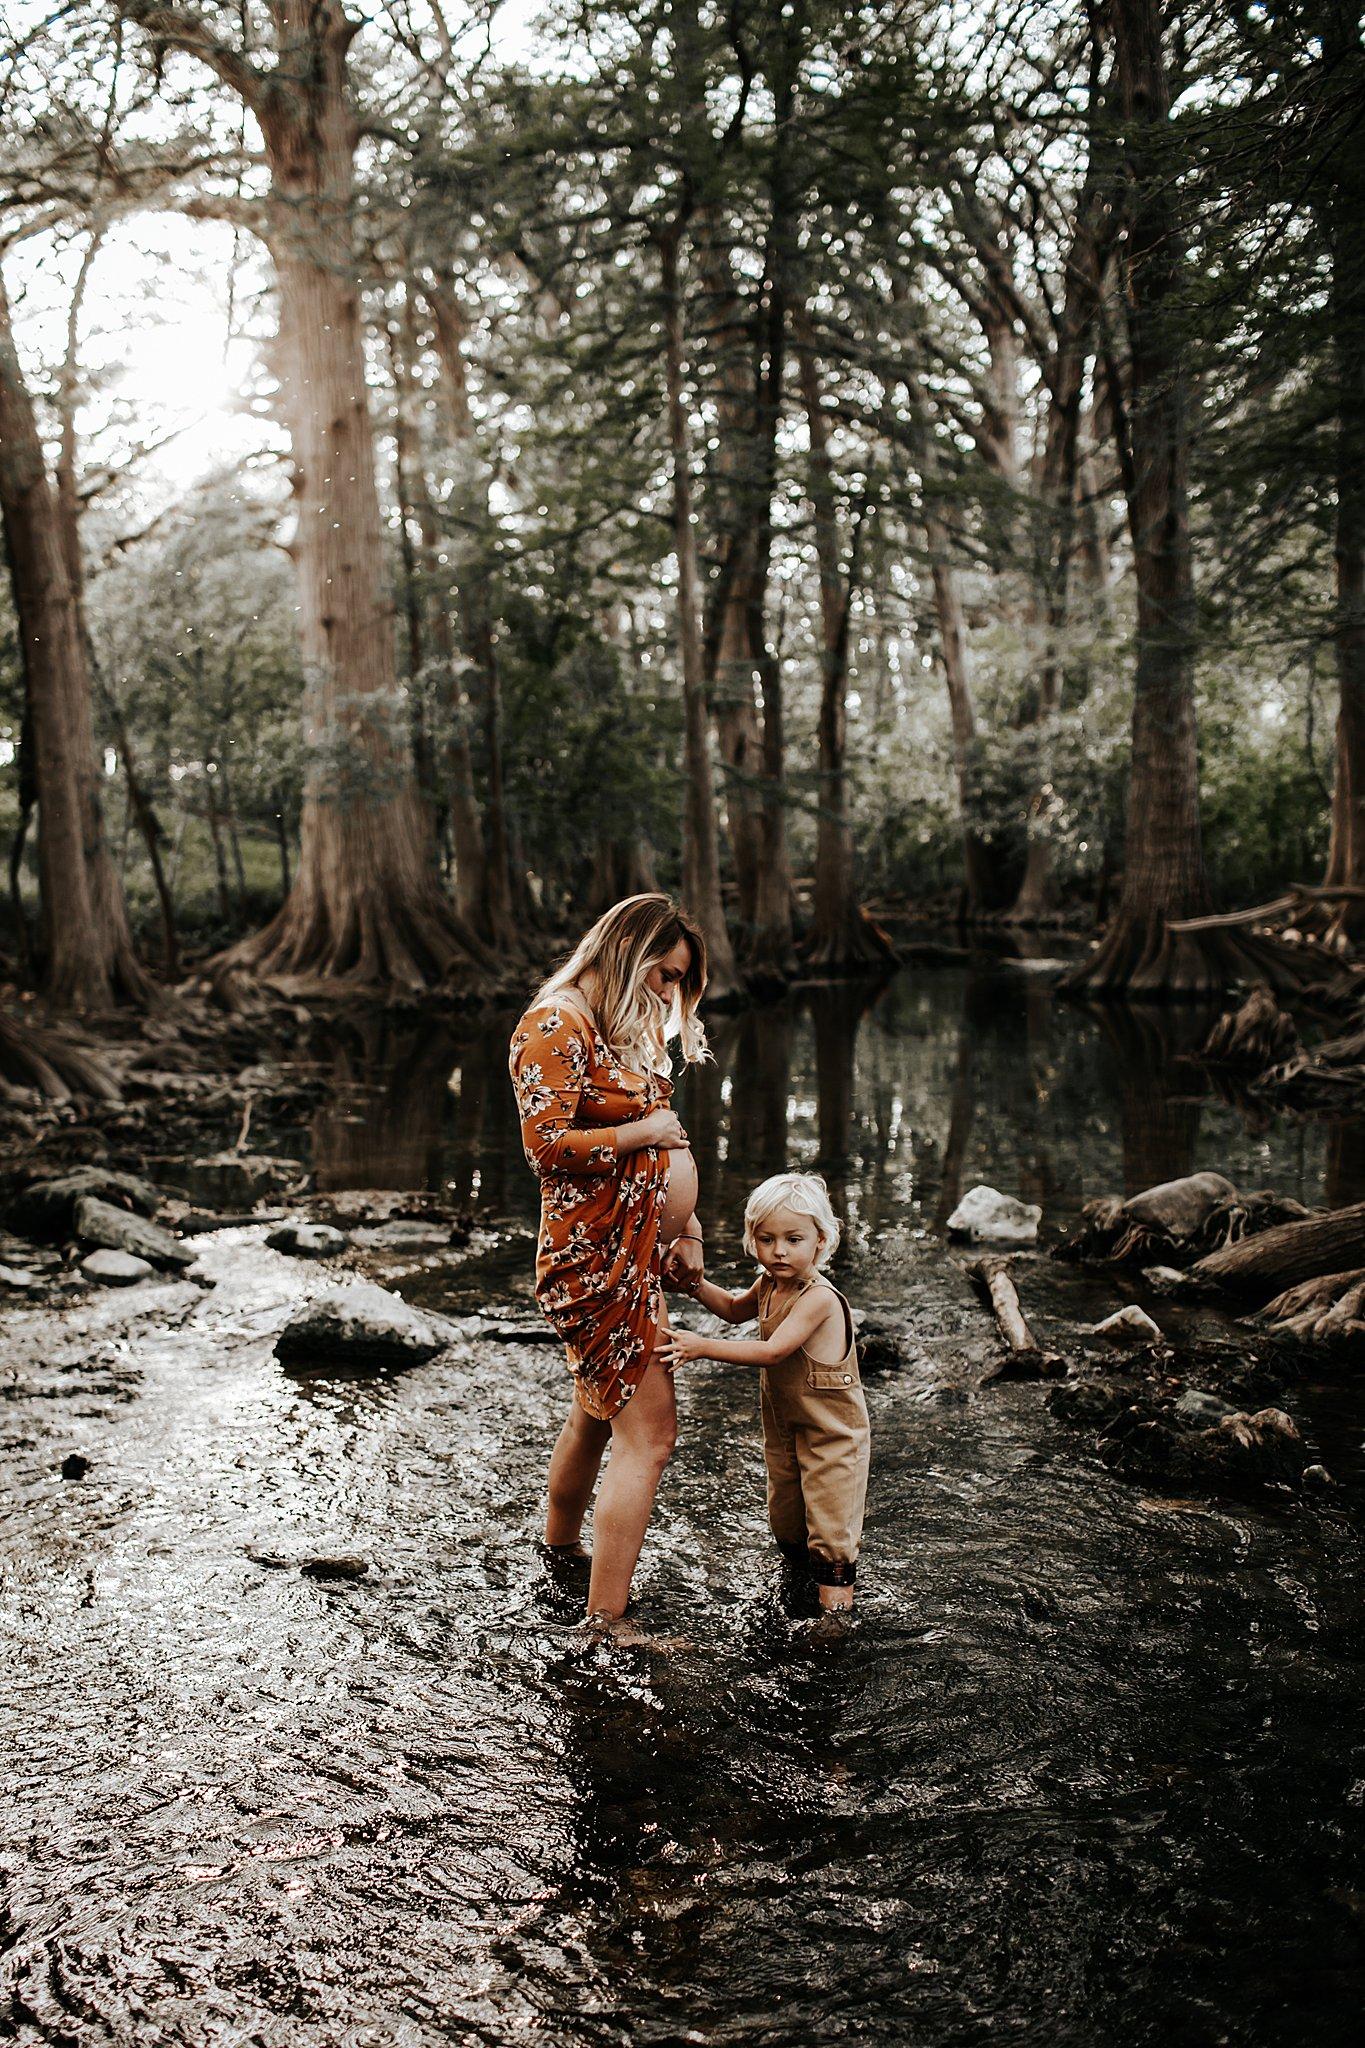 Shannon-San-Antonio-Maternity-Photographer-10_WEB.jpg